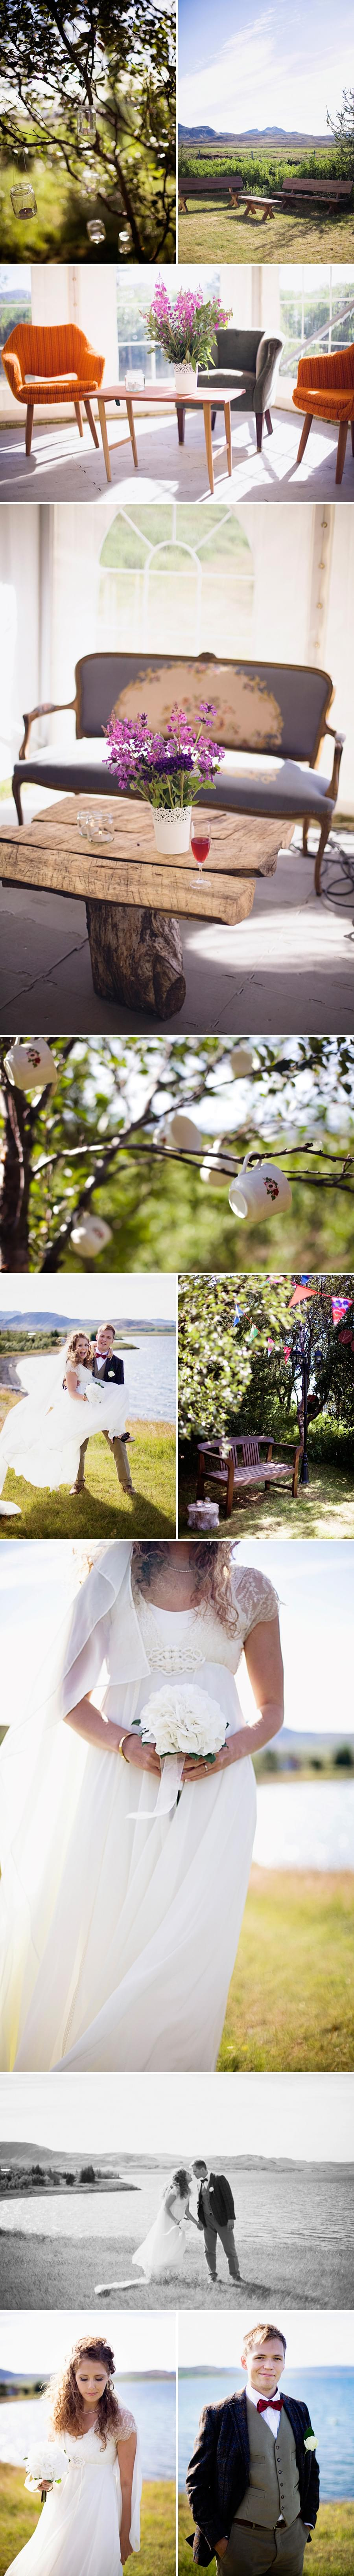 ślub na islandii gudny photography Kotstrandarkirkja